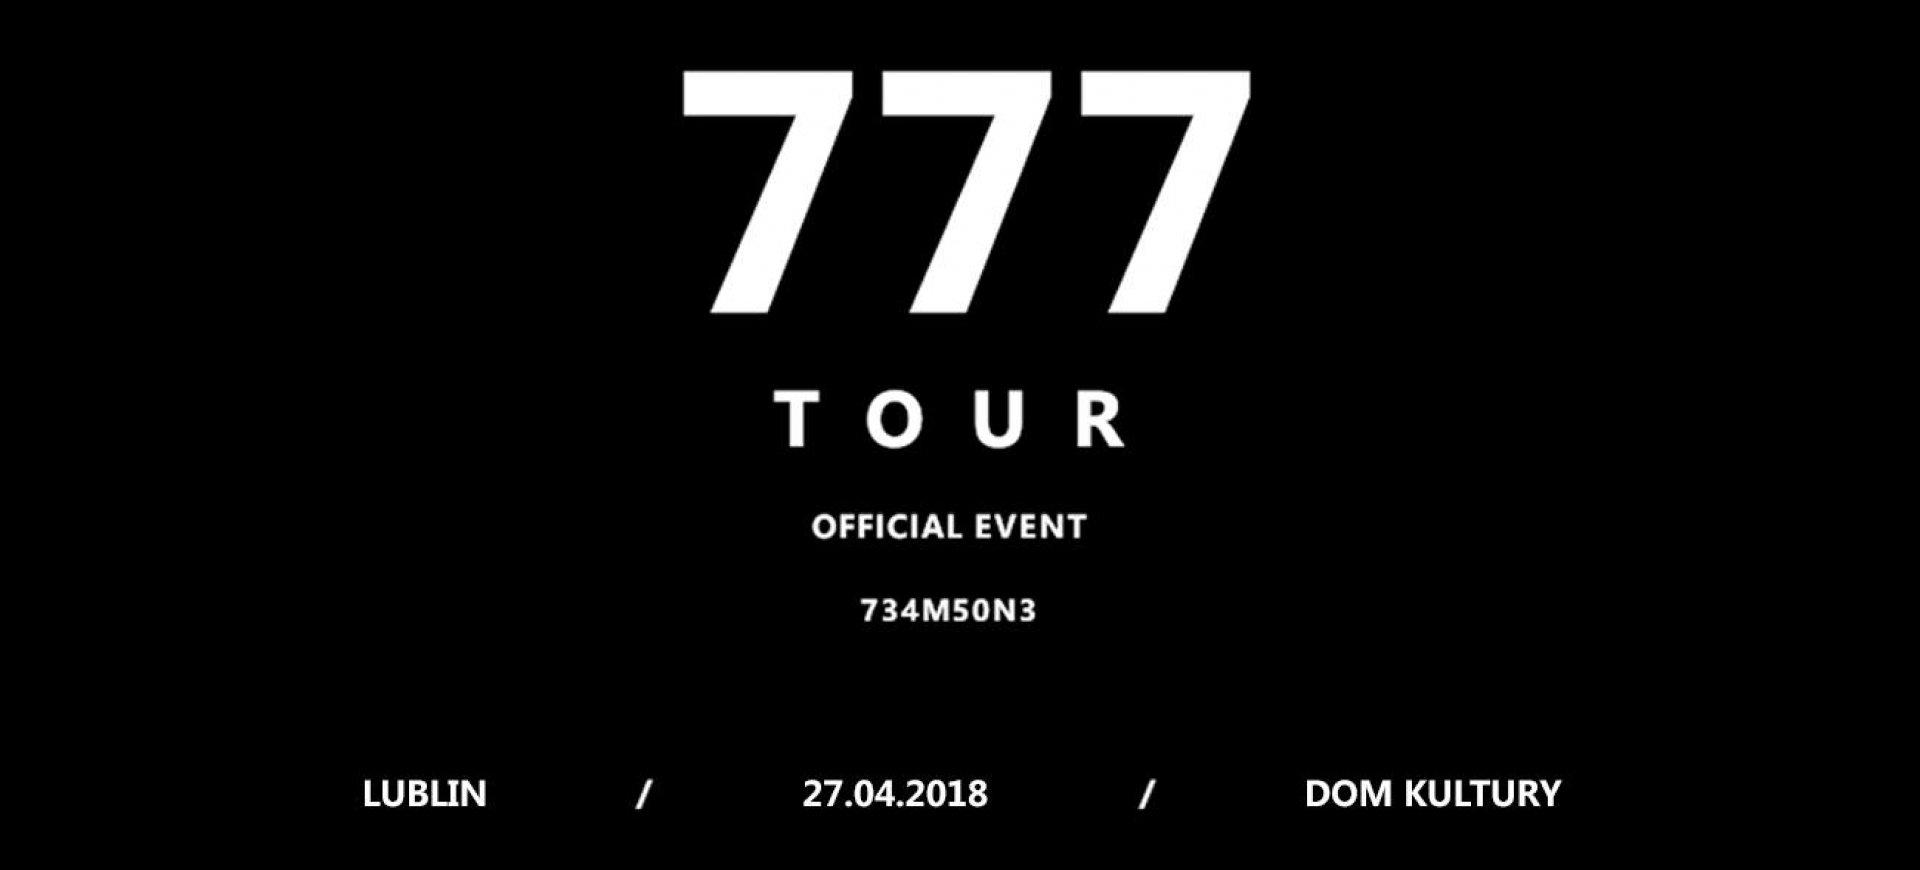 Zeamsone / 777 TOUR / Lublin